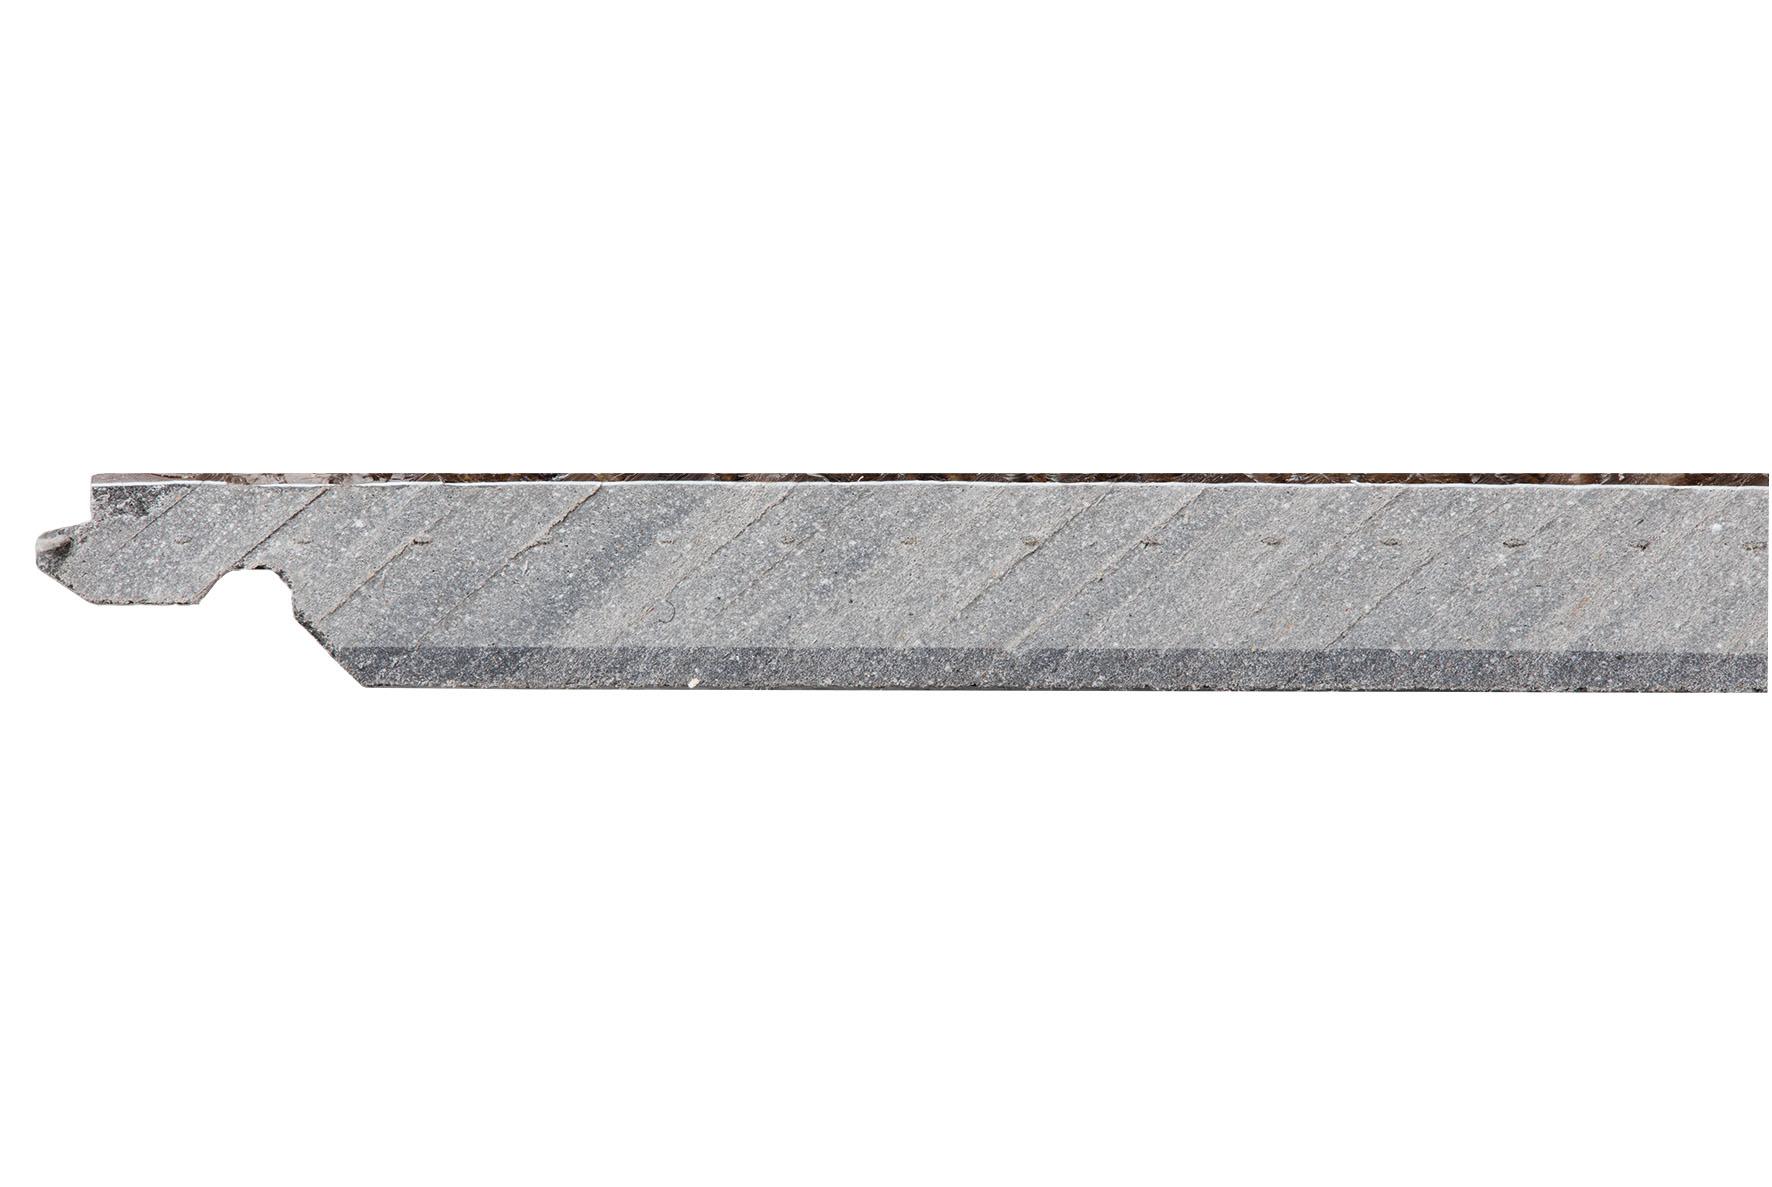 Vinfloors-LOCK-Querschnitt-Vinylboden-Vollvinyl-mit-Klicksystem